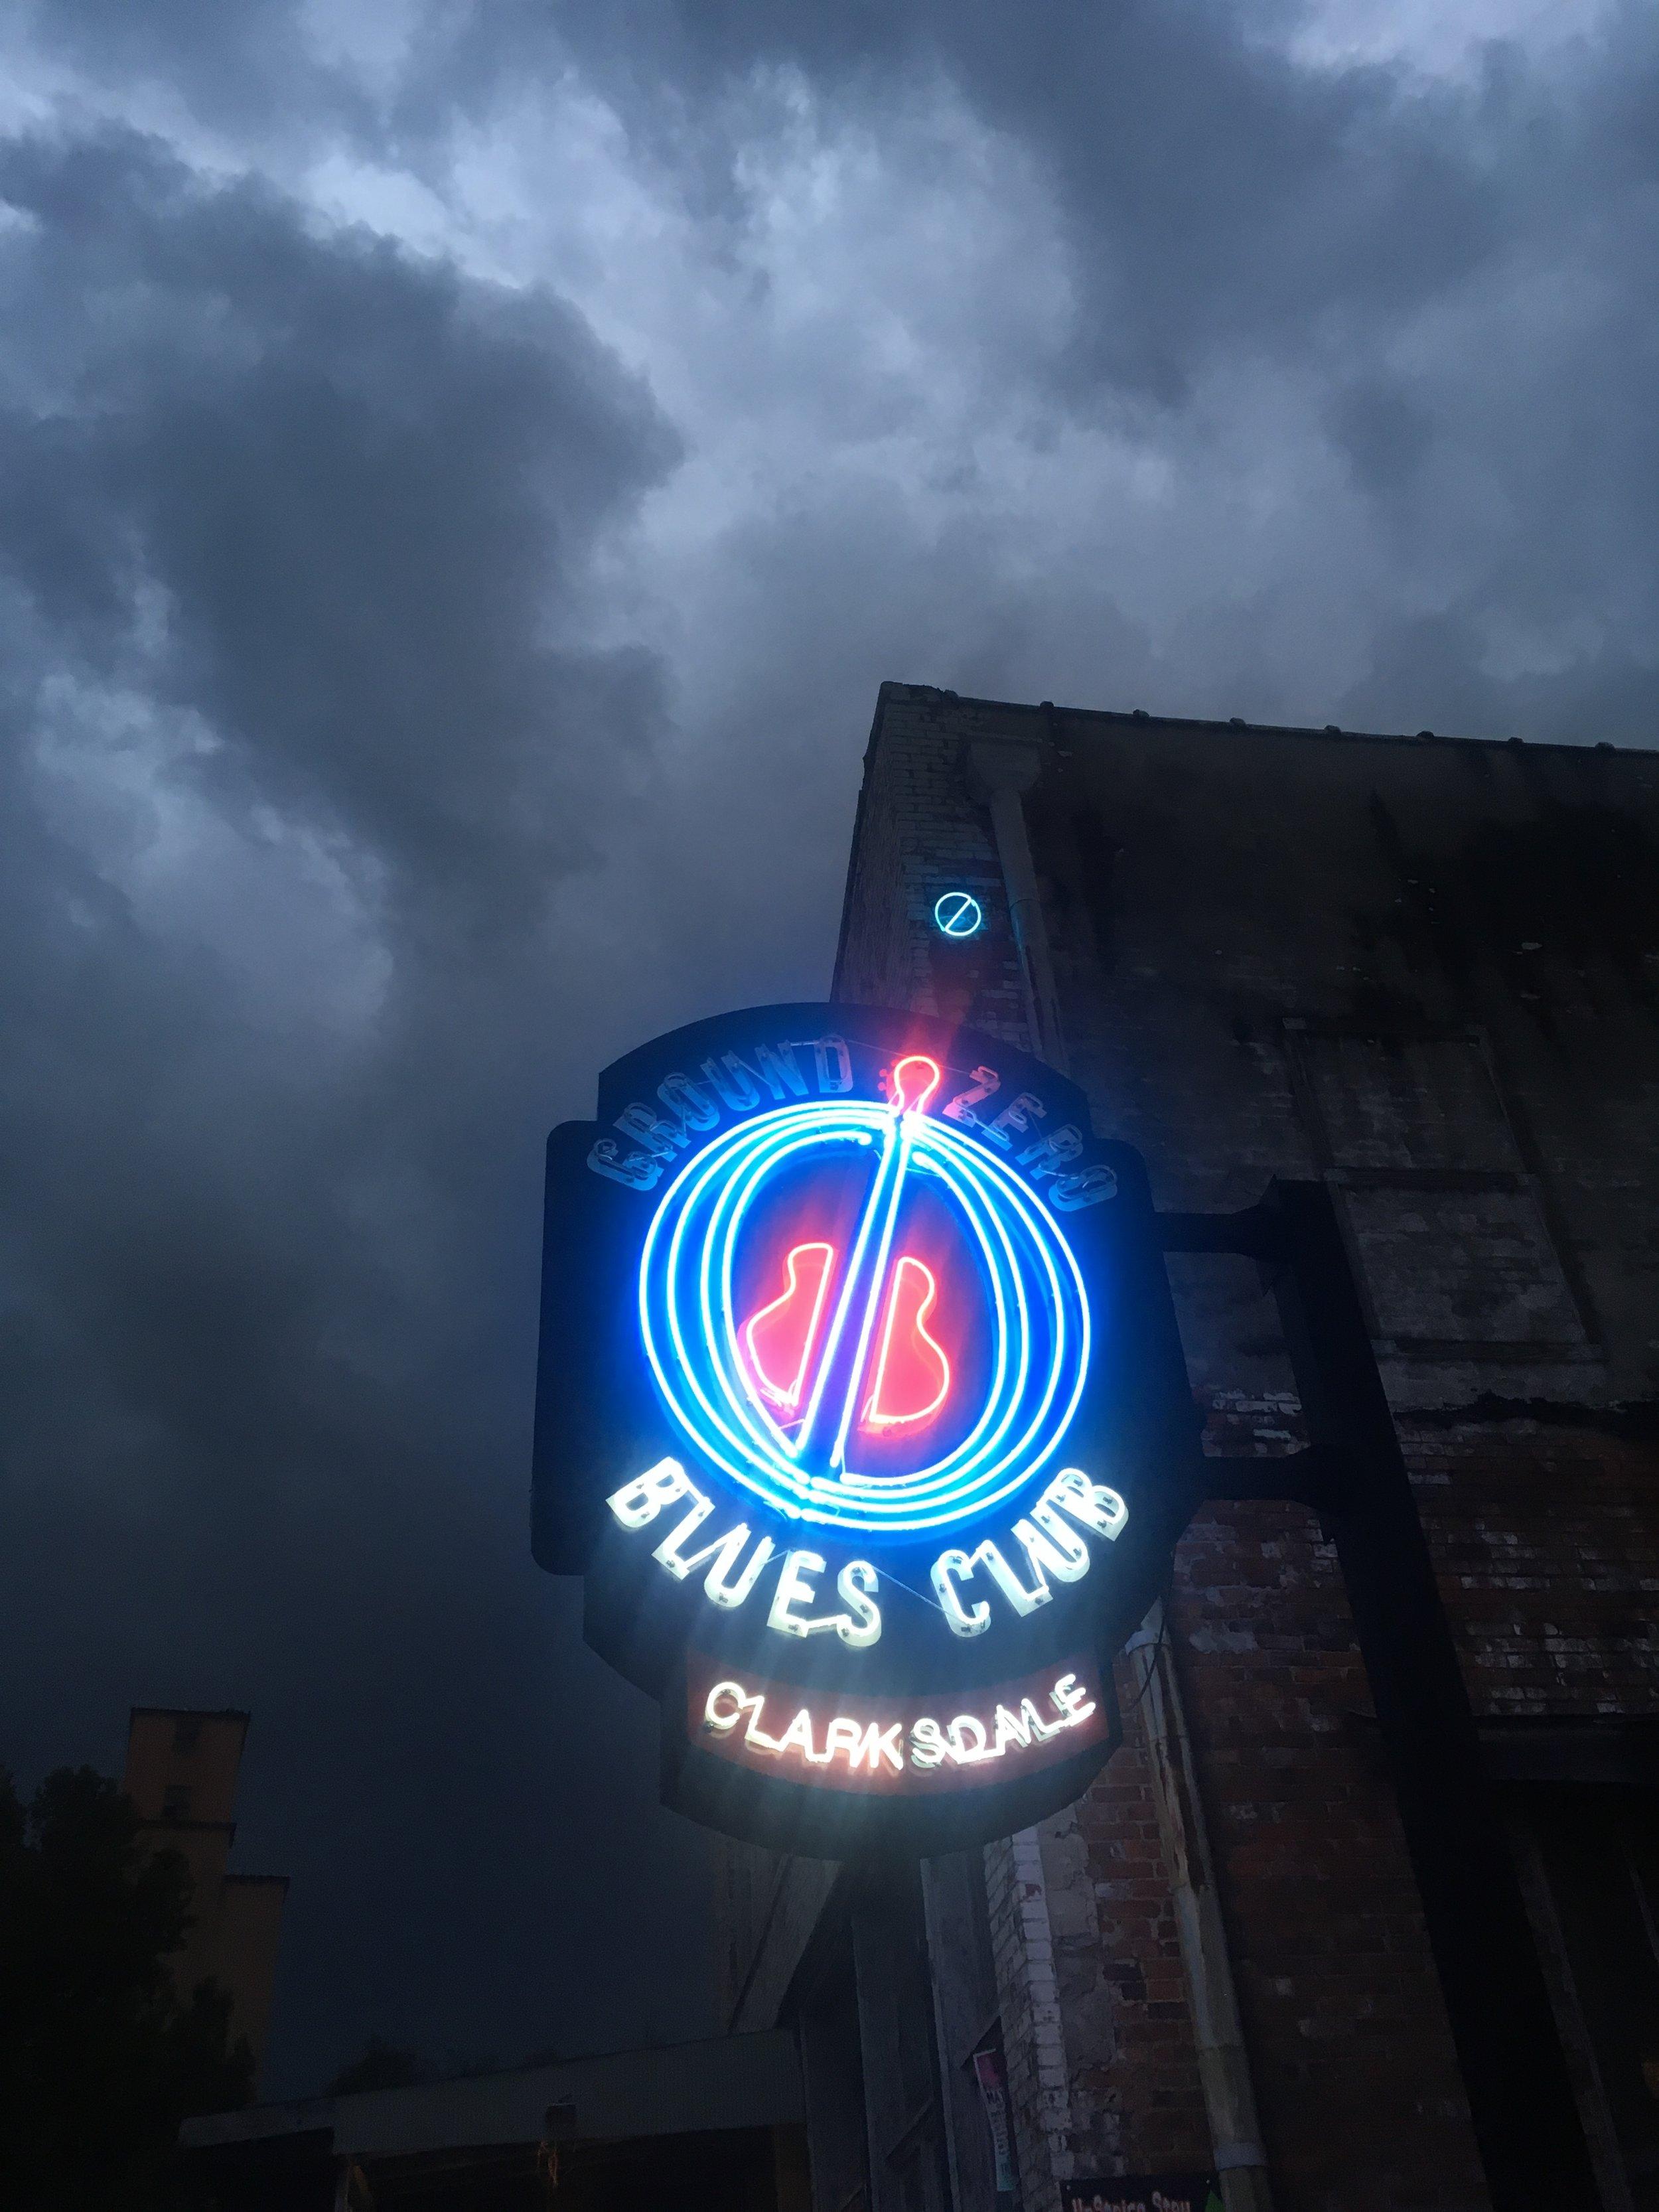 Ground Zero Blues Club in Clarksdale, Mississippi